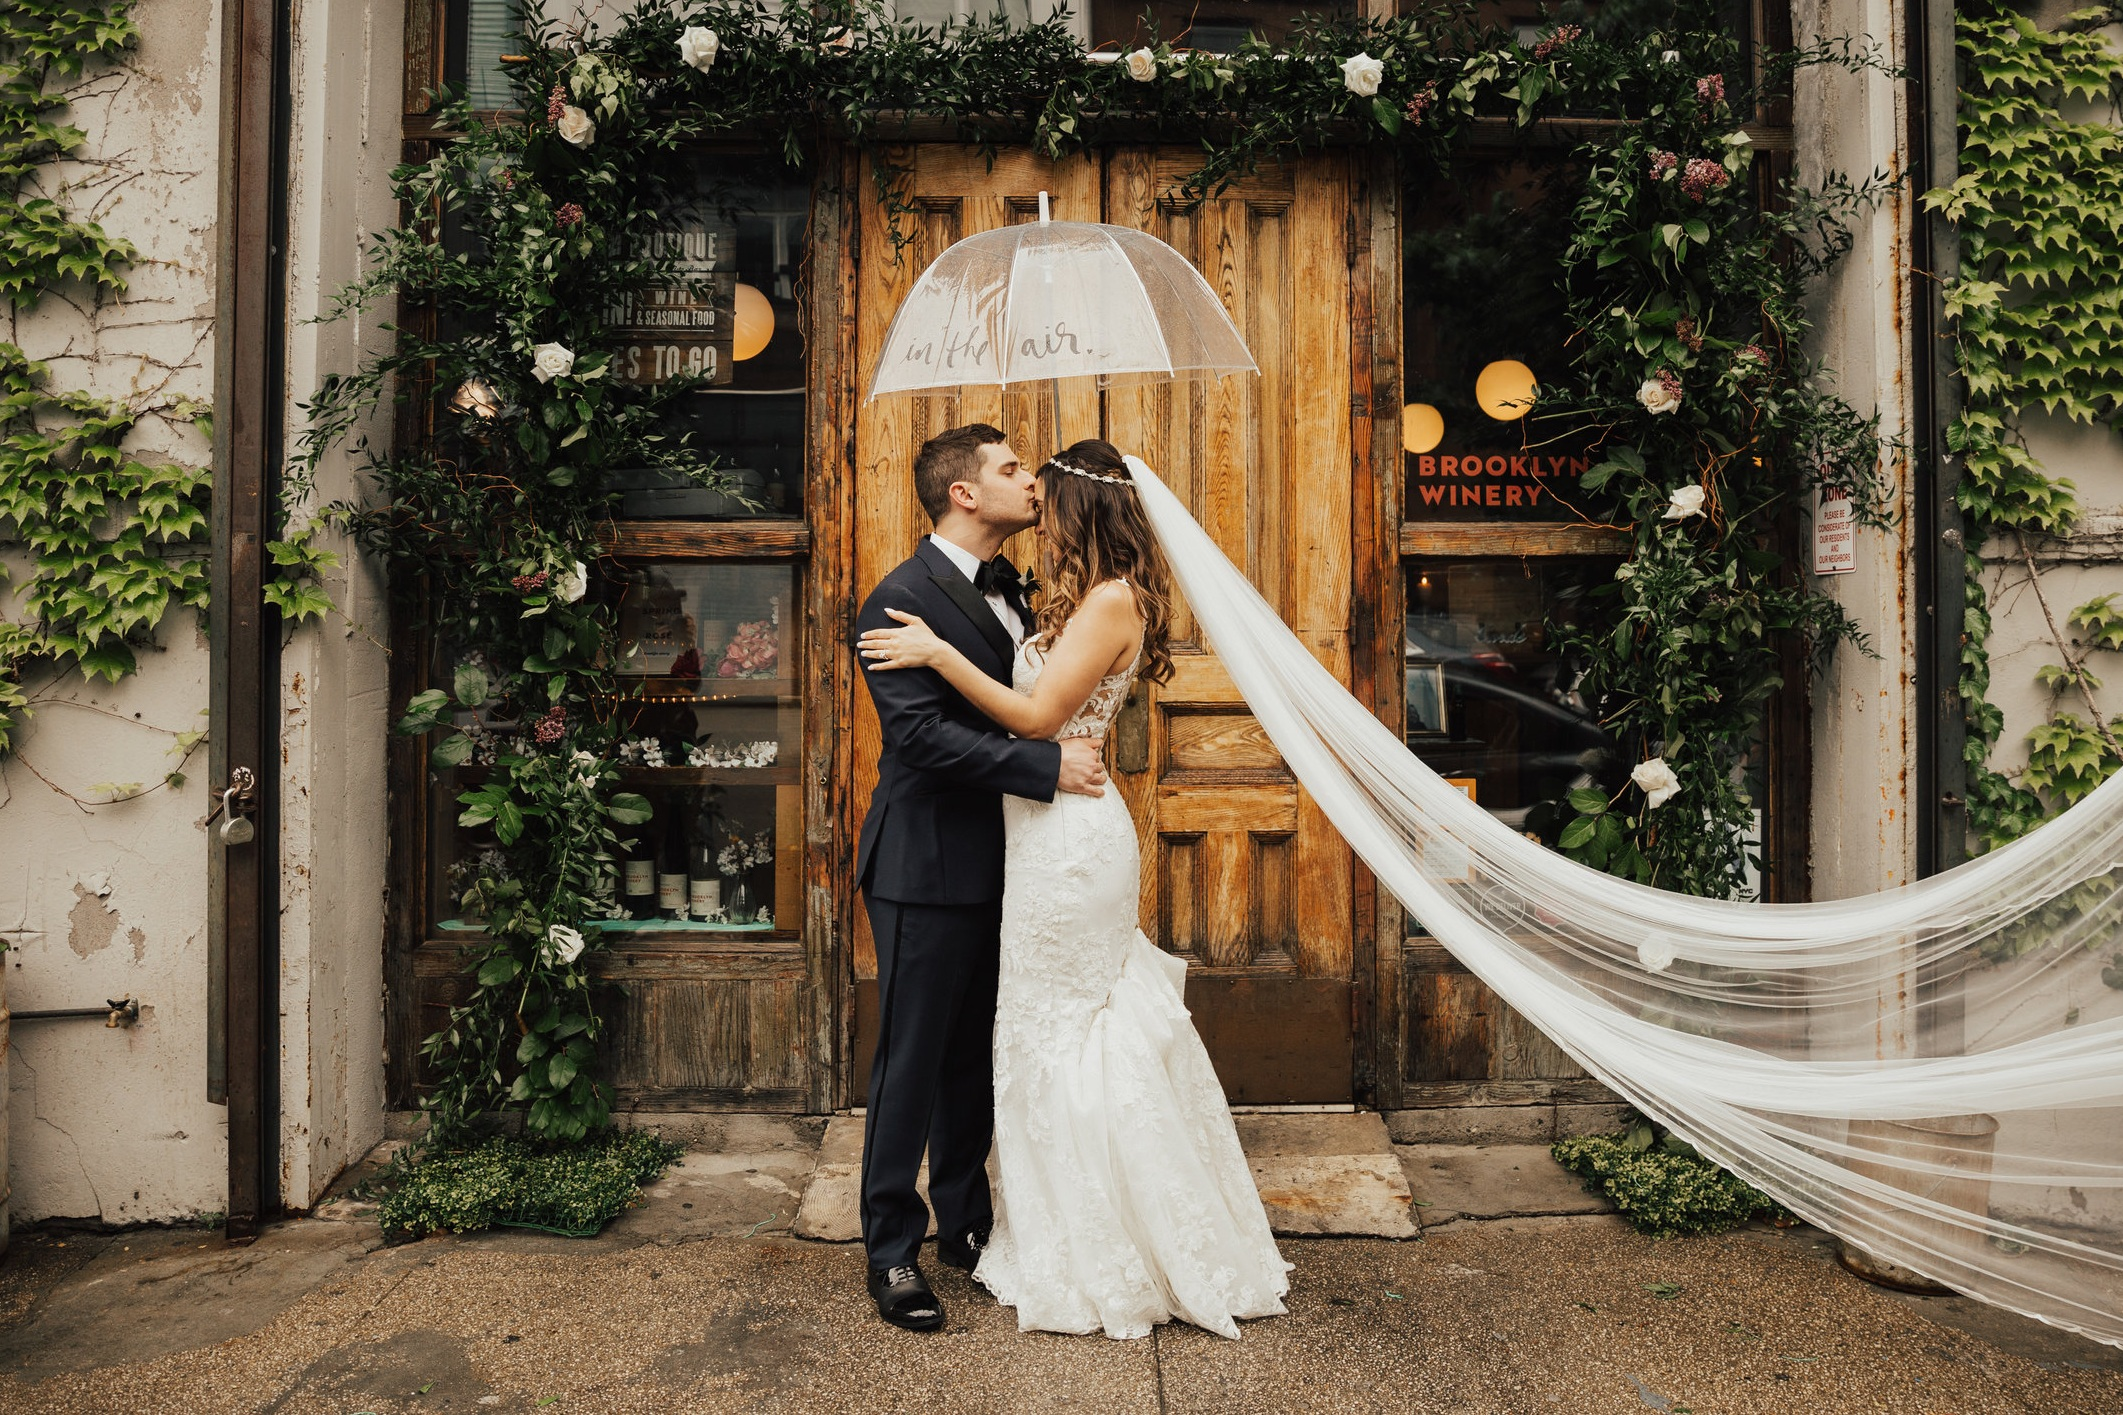 Angelica + Ryan - Brooklyn Winery Wedding